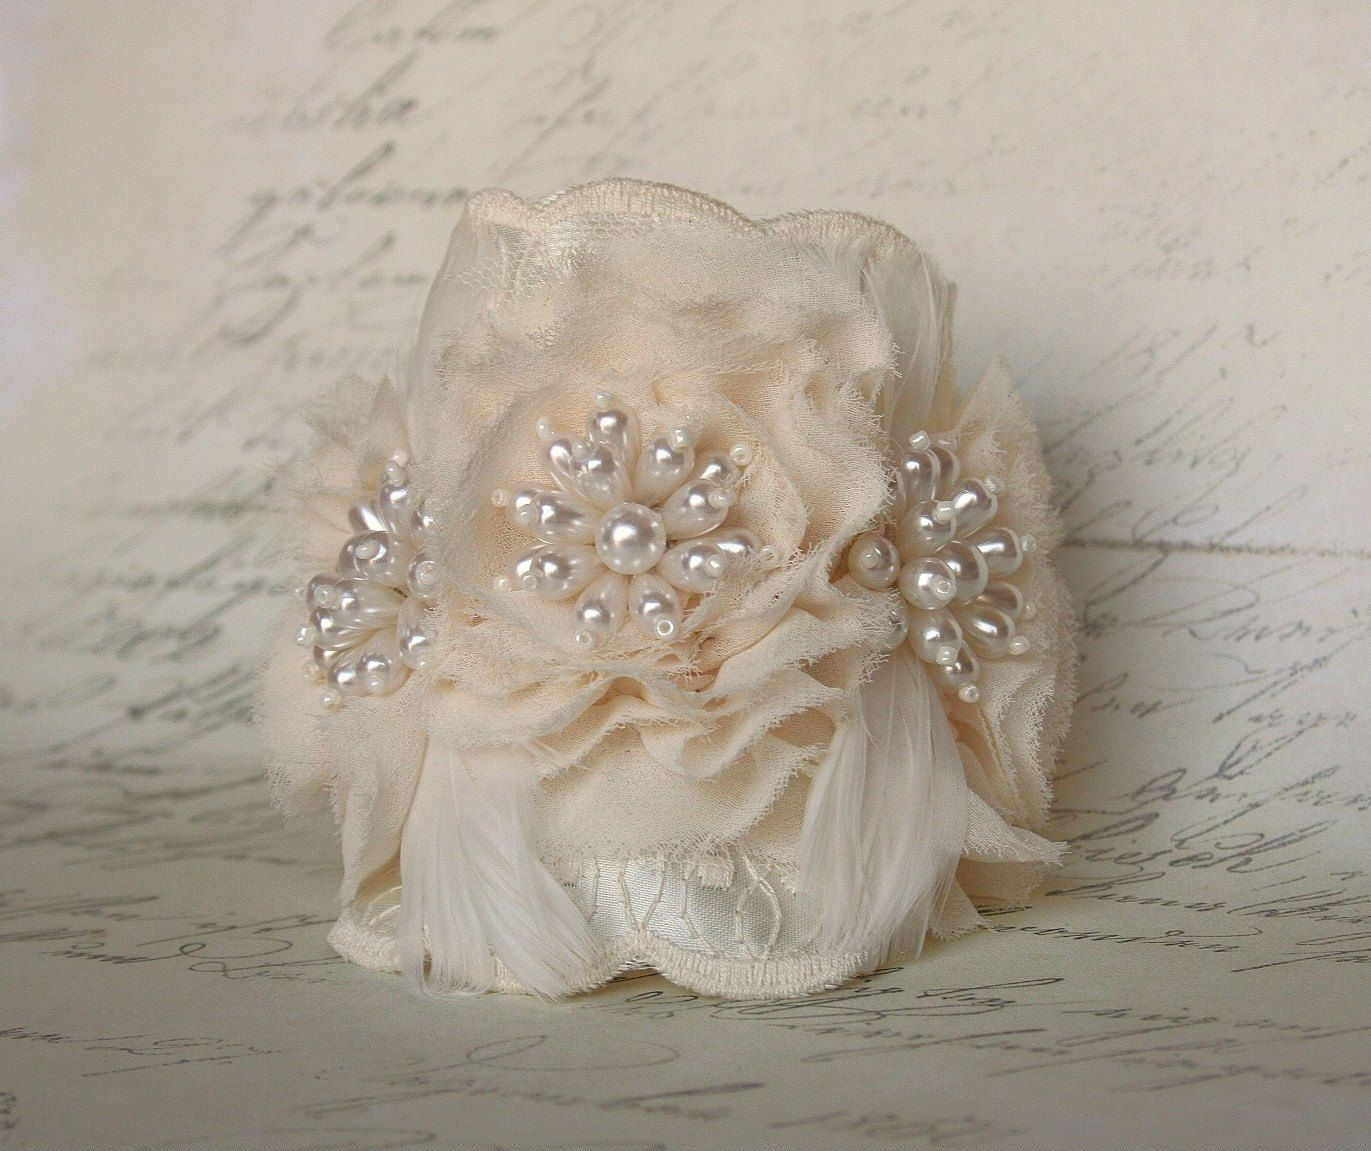 Wedding Bracelet, Bridal, Wedding, Jewelry, Bracelet, Cuff, Ivory, Lace, Feather, Pearl. $48.00, via Etsy.